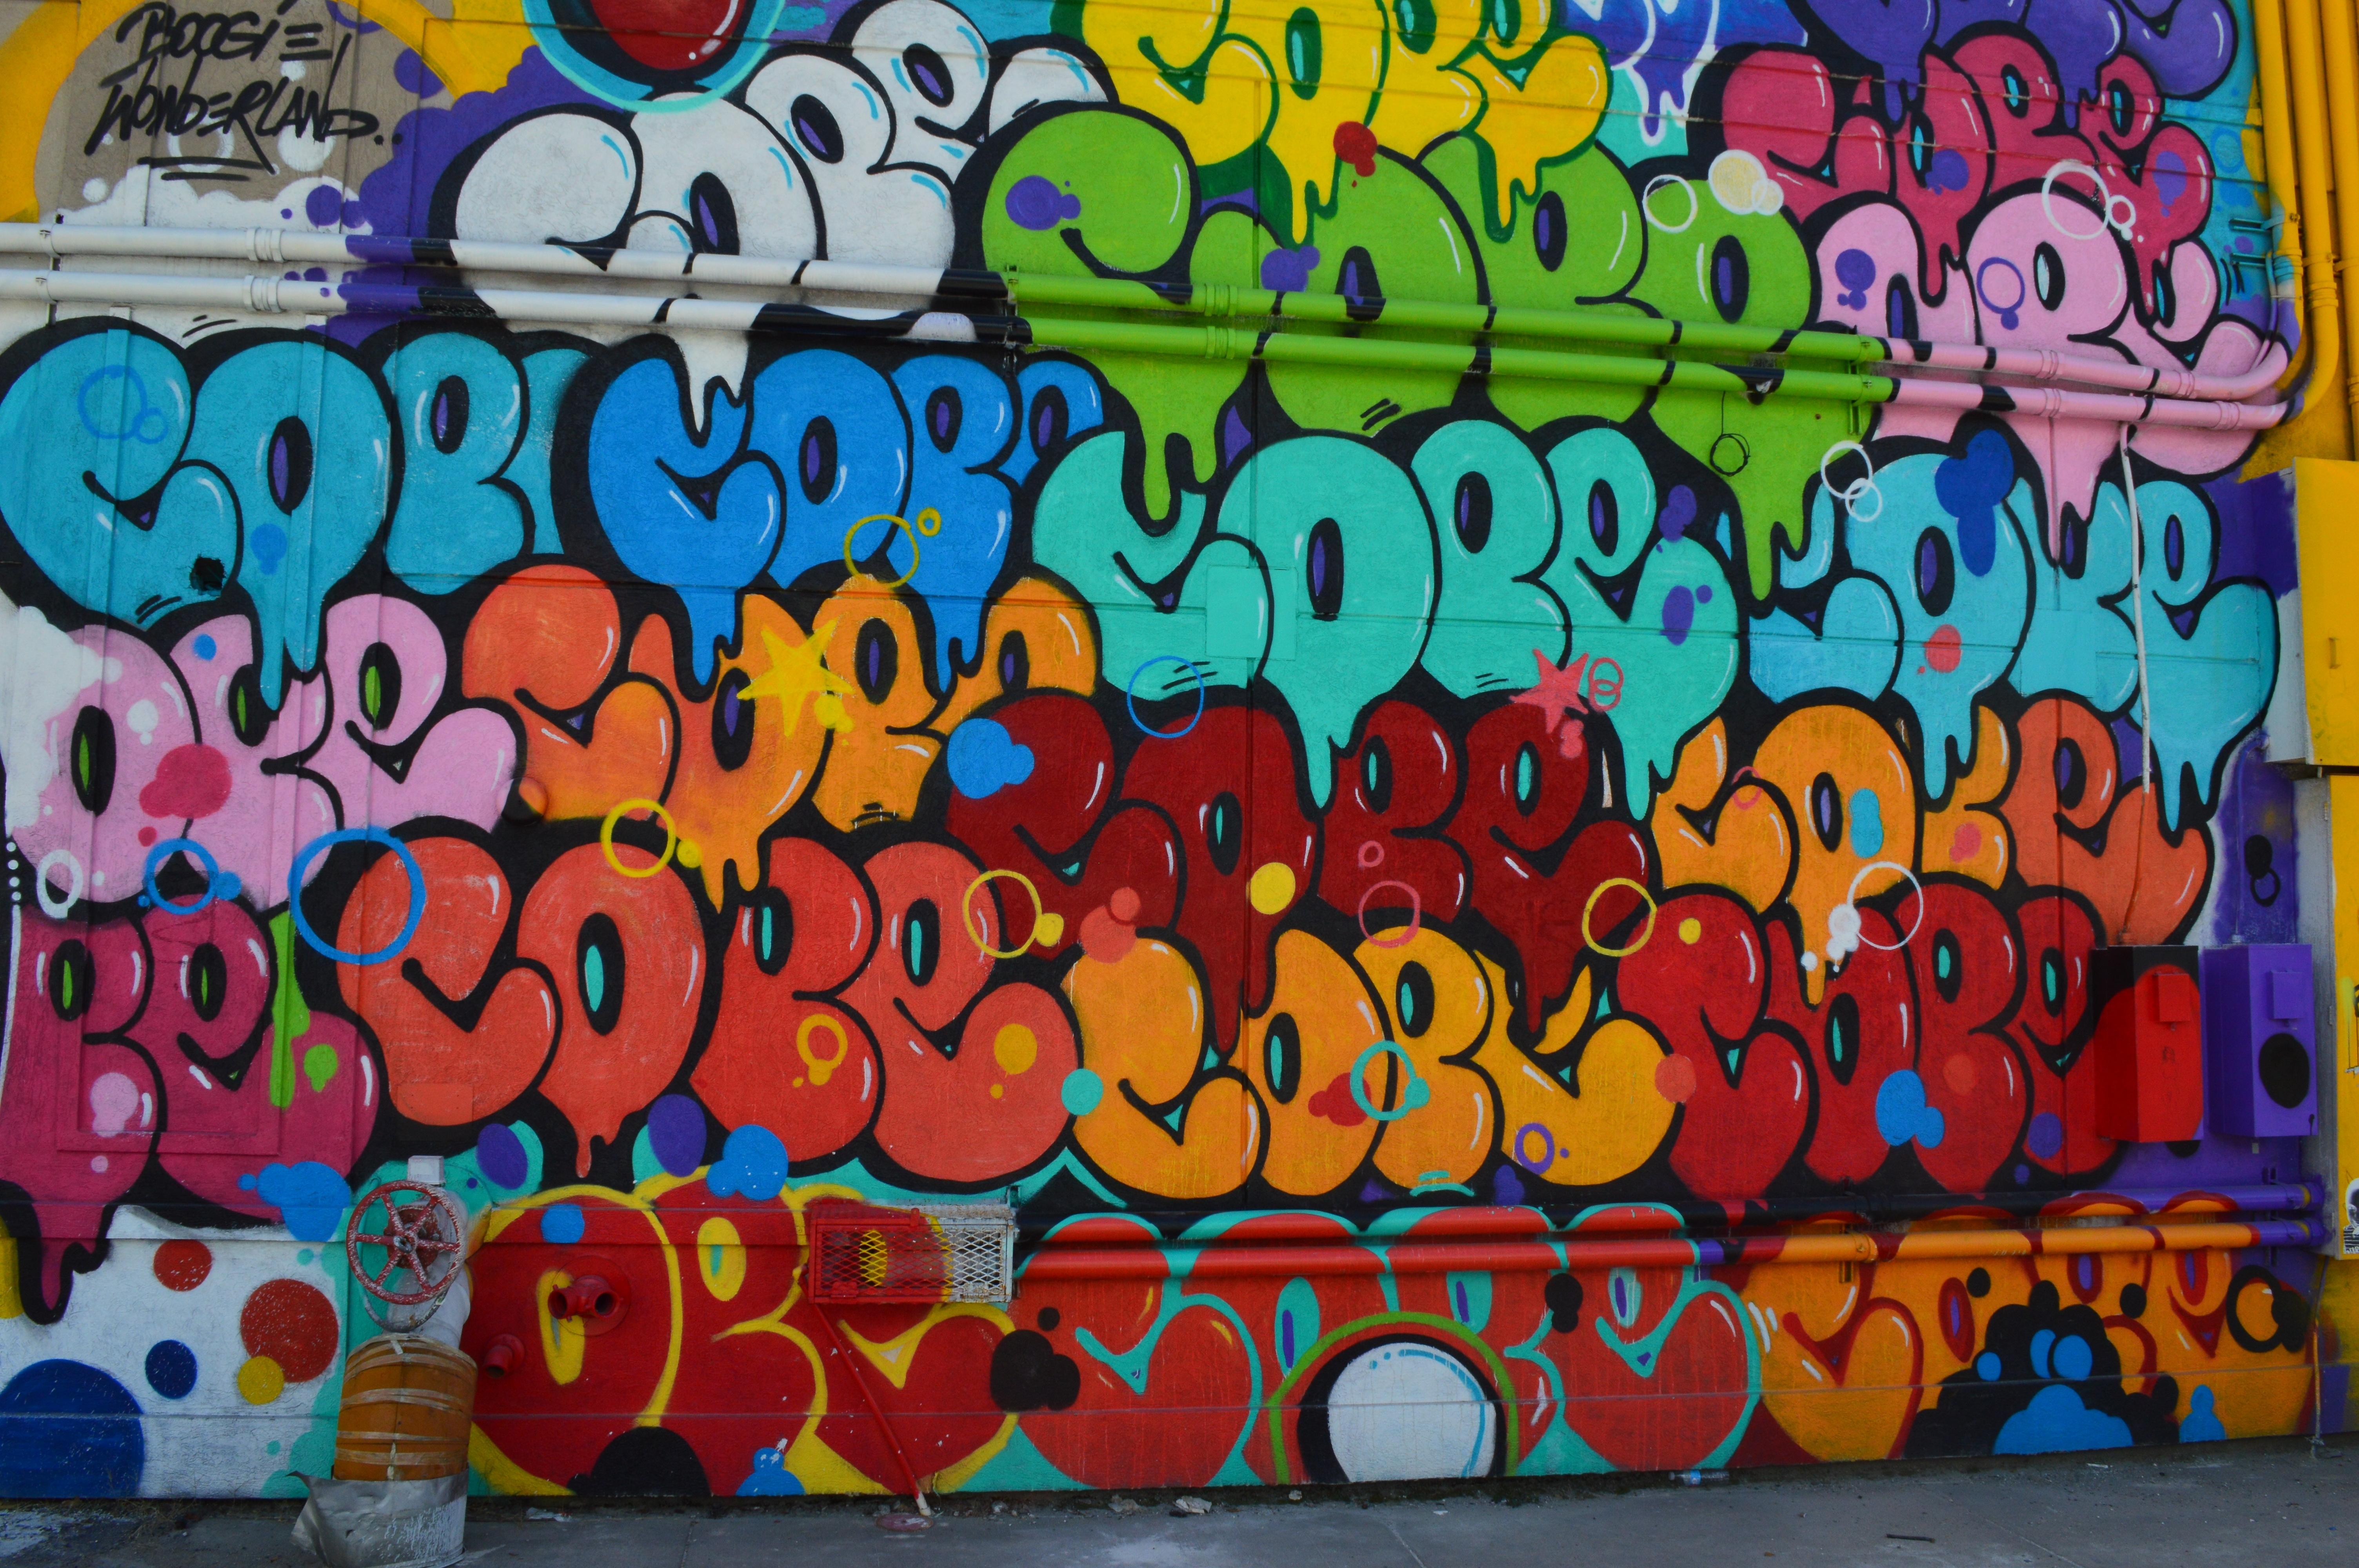 Houston Street Art To See Inside Graffiti Wall Art (View 18 of 20)